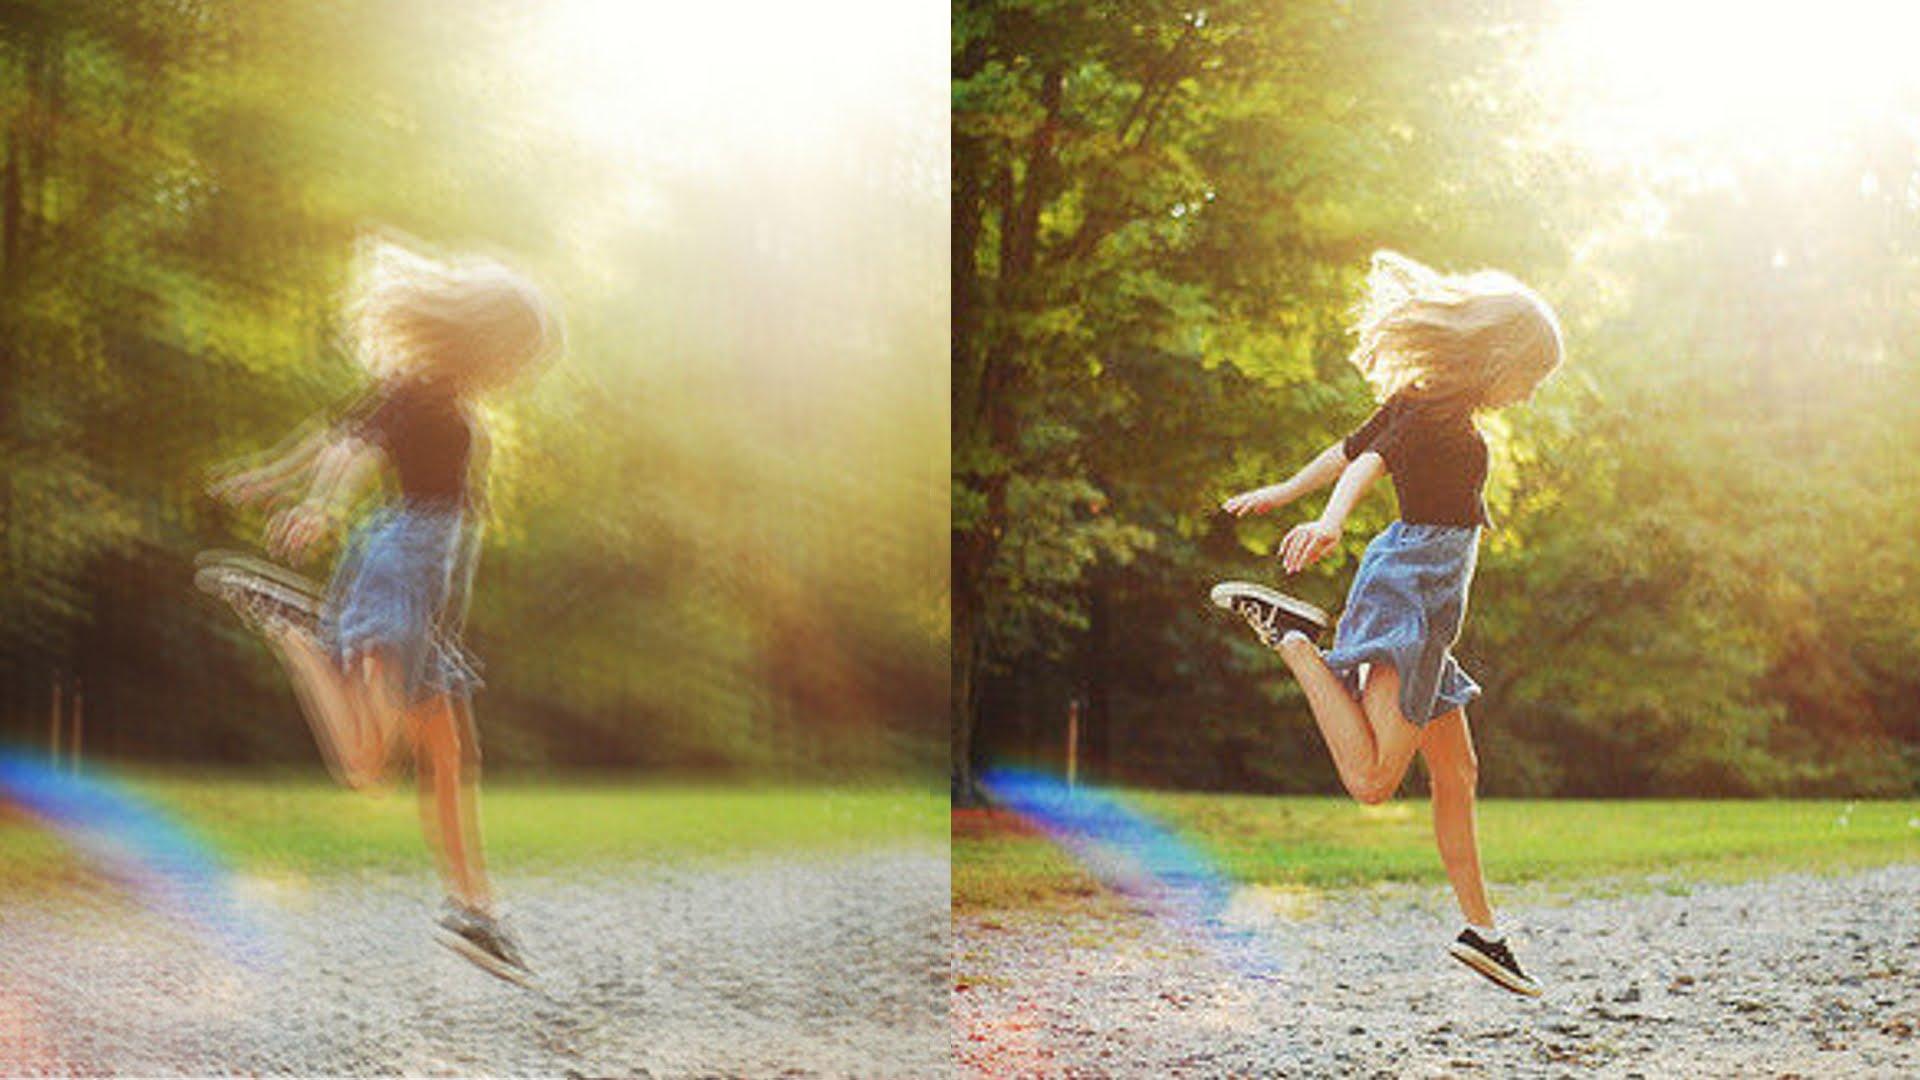 Blur vs clear image